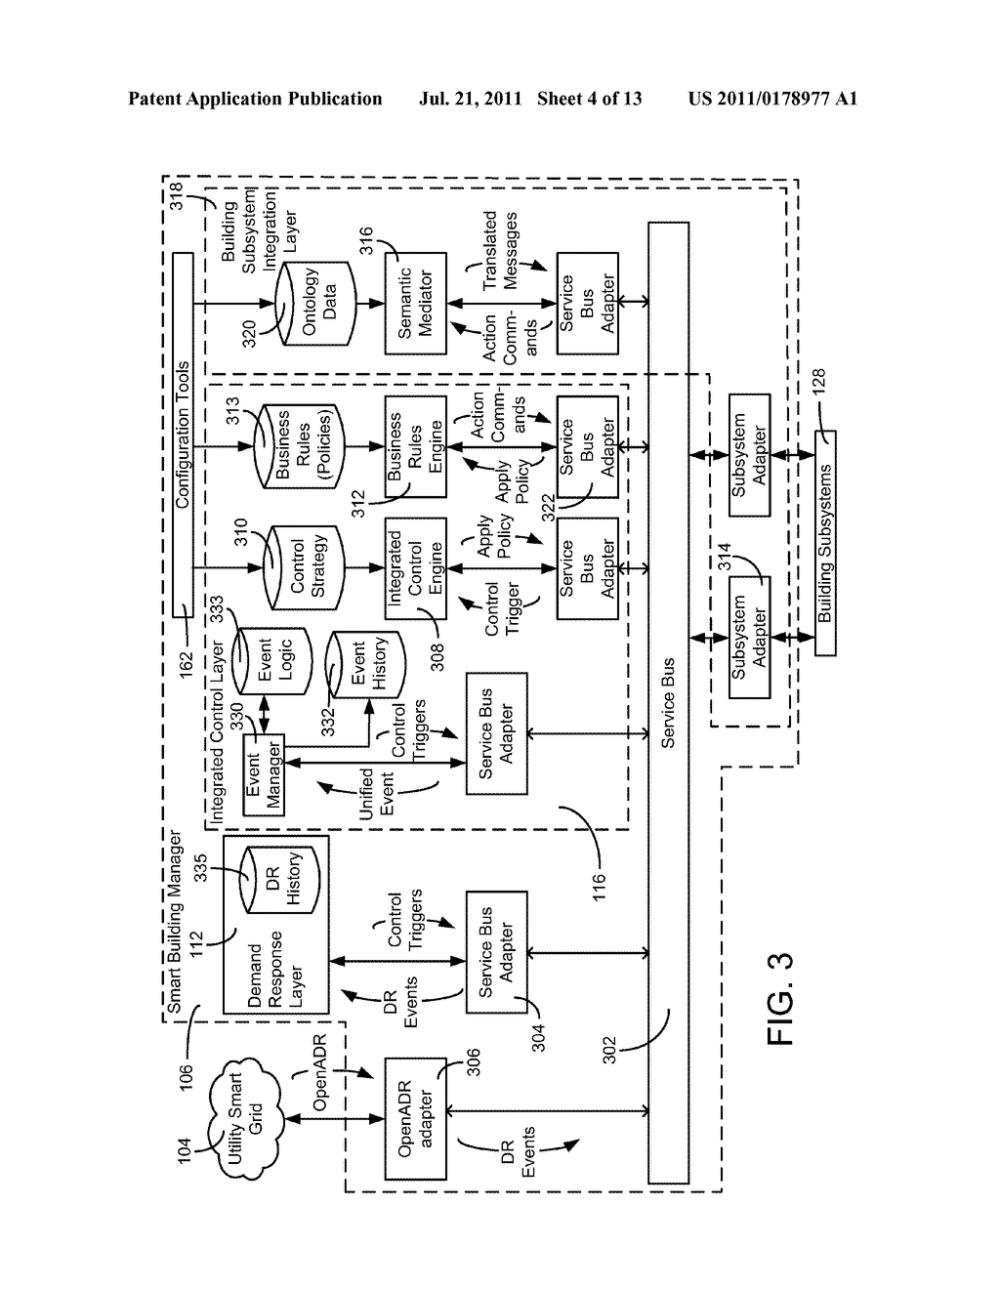 medium resolution of building management system schematic diagram